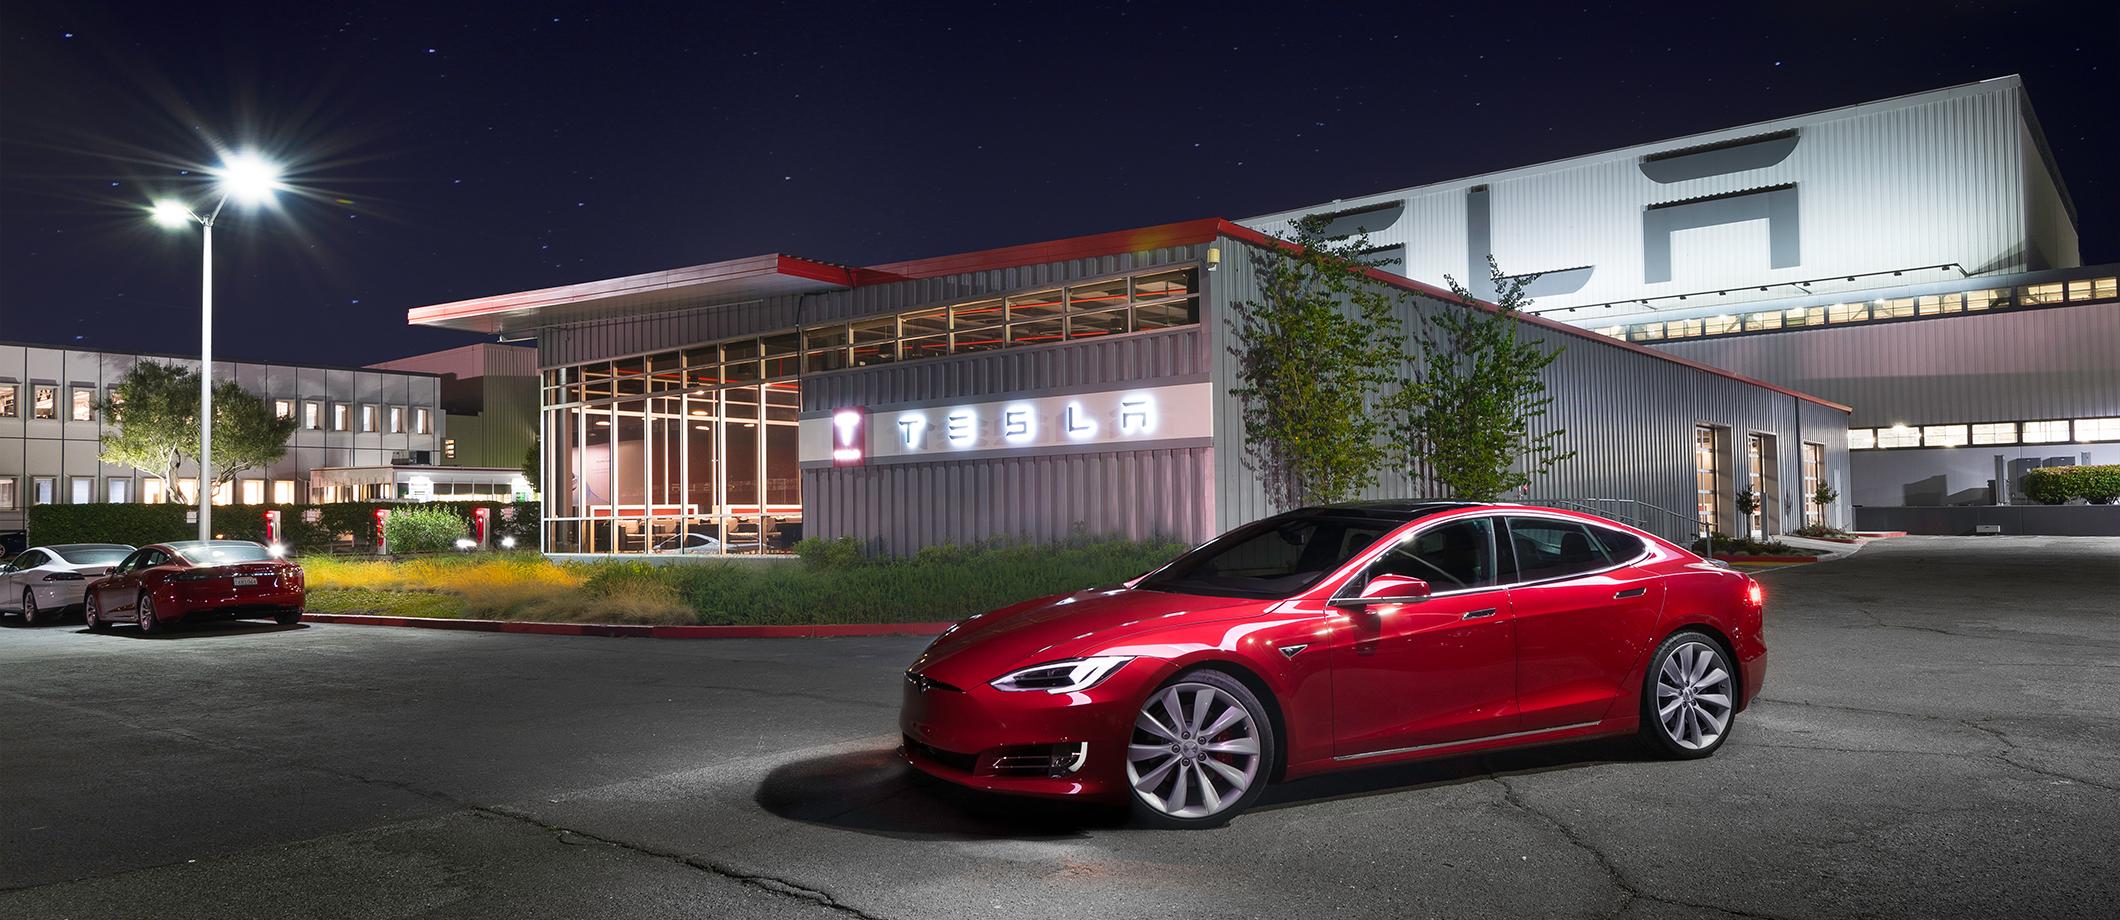 Model S parked outside of Tesla's Fremont factory